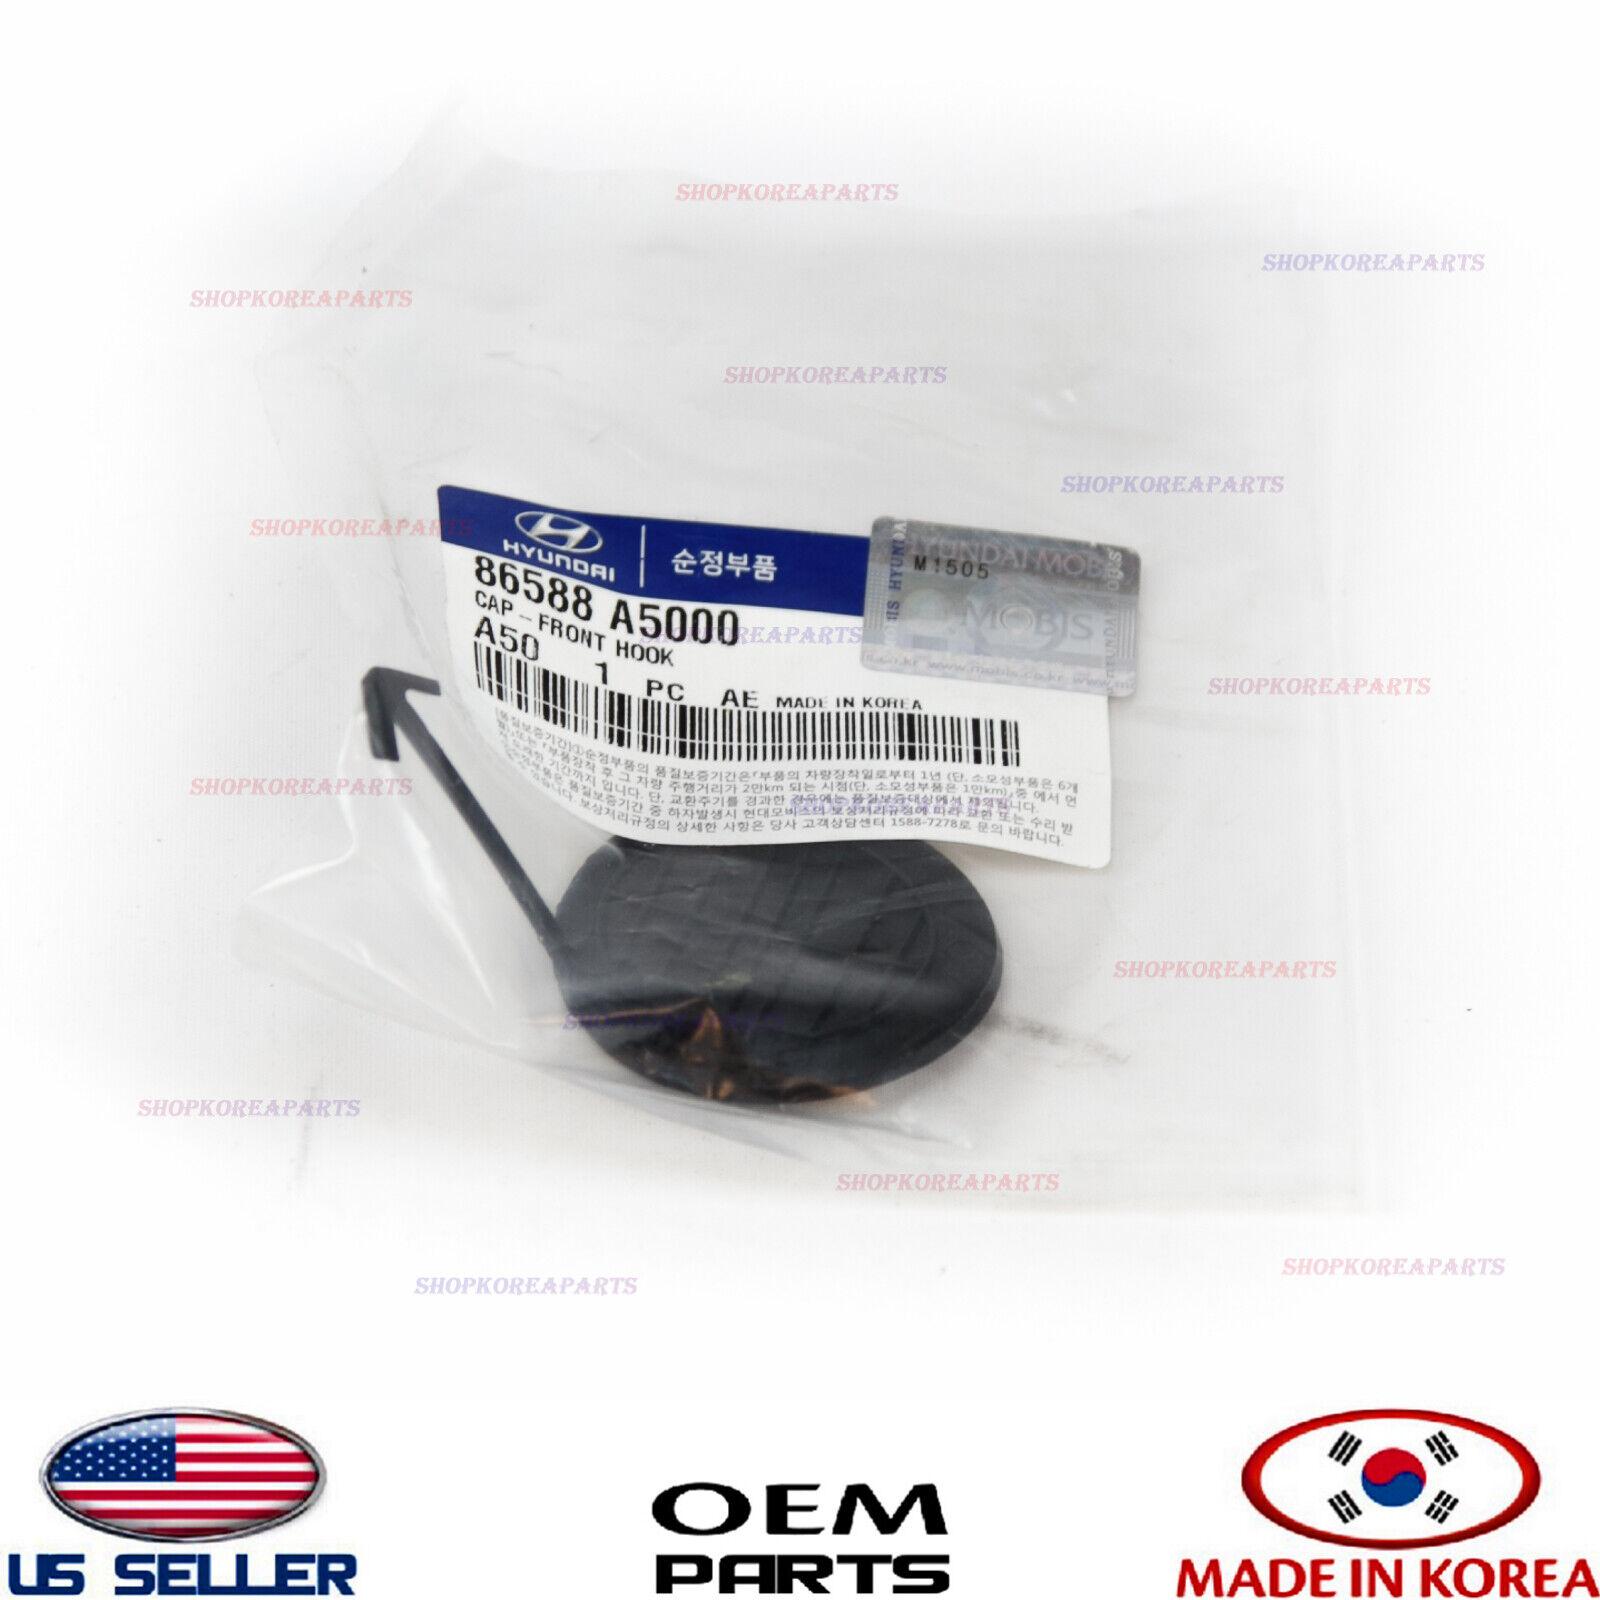 Fleeced Satin Black FS17372F5 Covercraft Custom Fit Car Cover for Select Mazda 2 Models